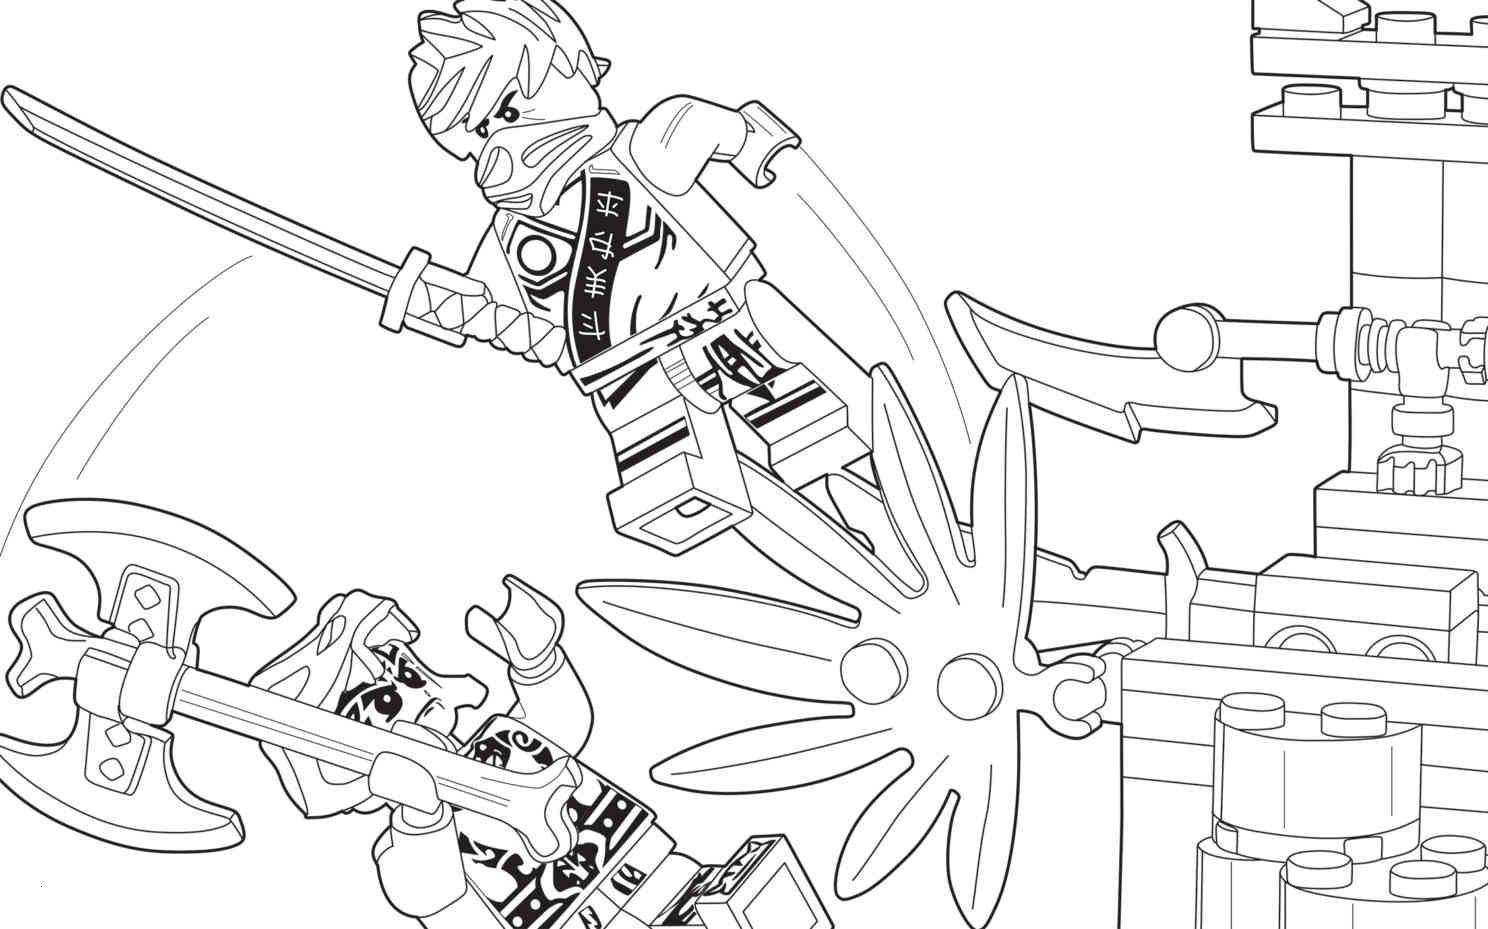 Lego Ausmalbilder Kostenlos Neu 37 Lego Ninjago Malvorlagen Scoredatscore Schön Ausmalbilder Ninjago Bilder